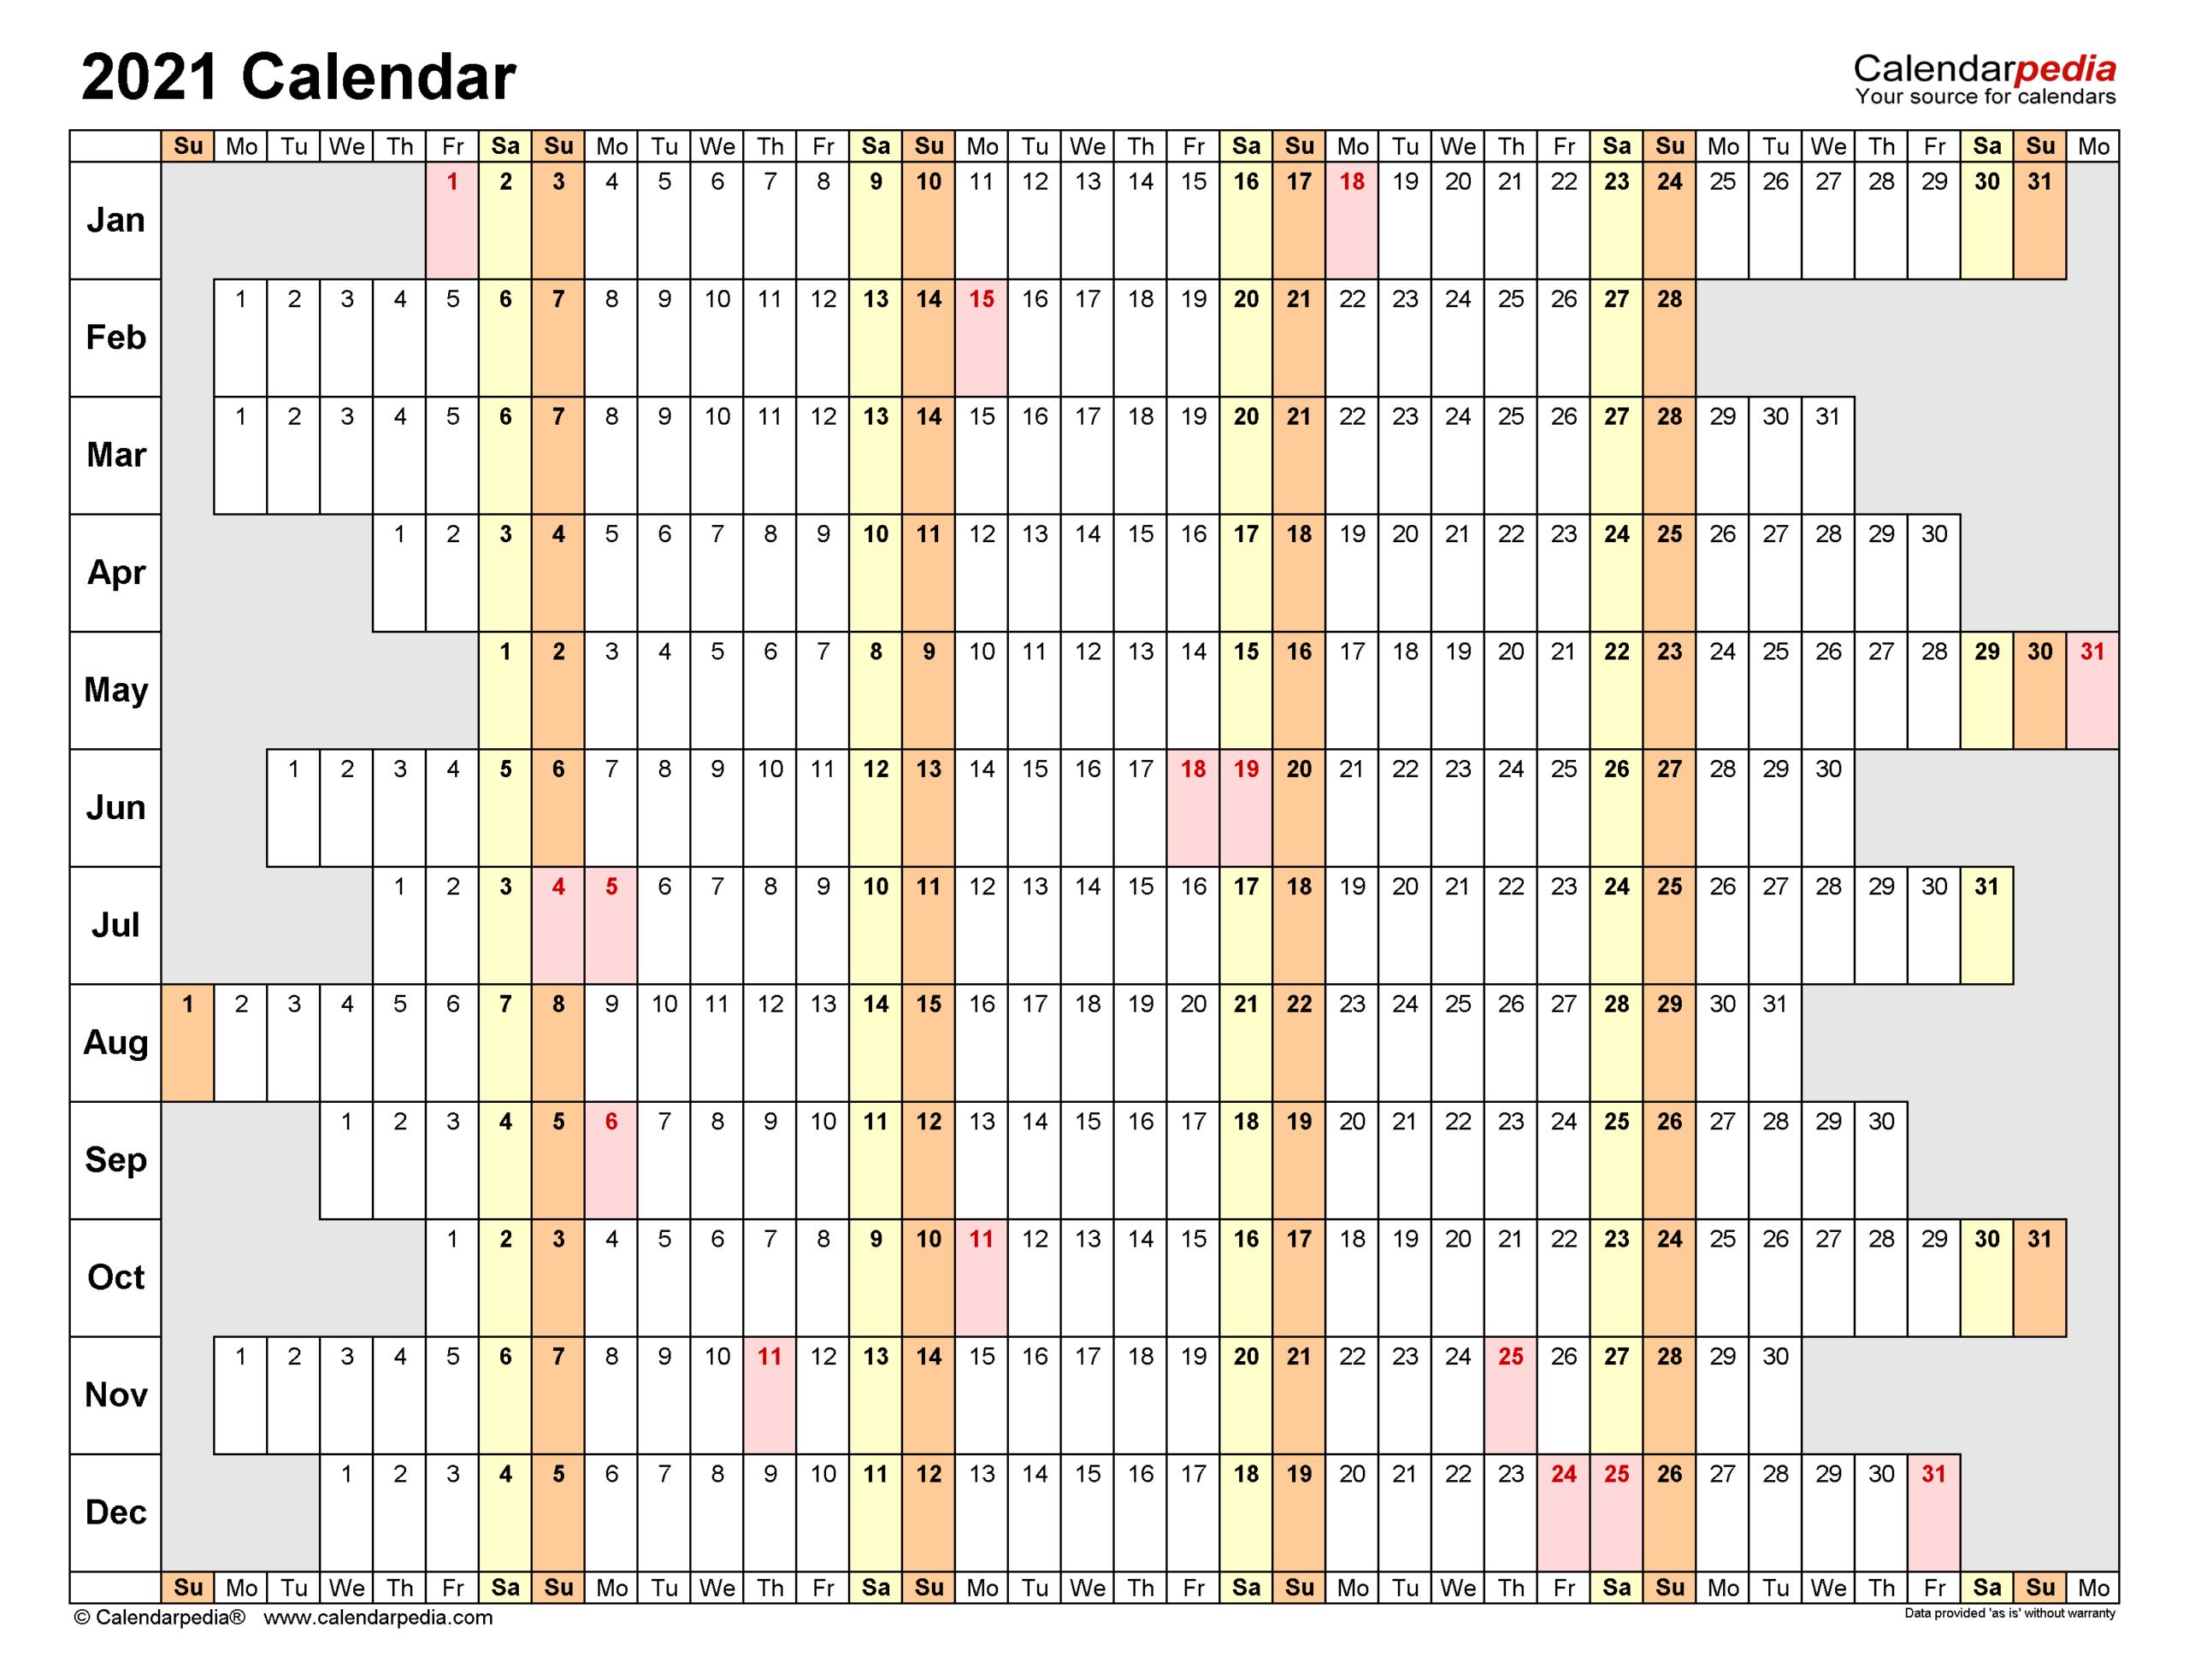 2021 Calendar - Free Printable Excel Templates - Calendarpedia-Excel Calendar Template 2021